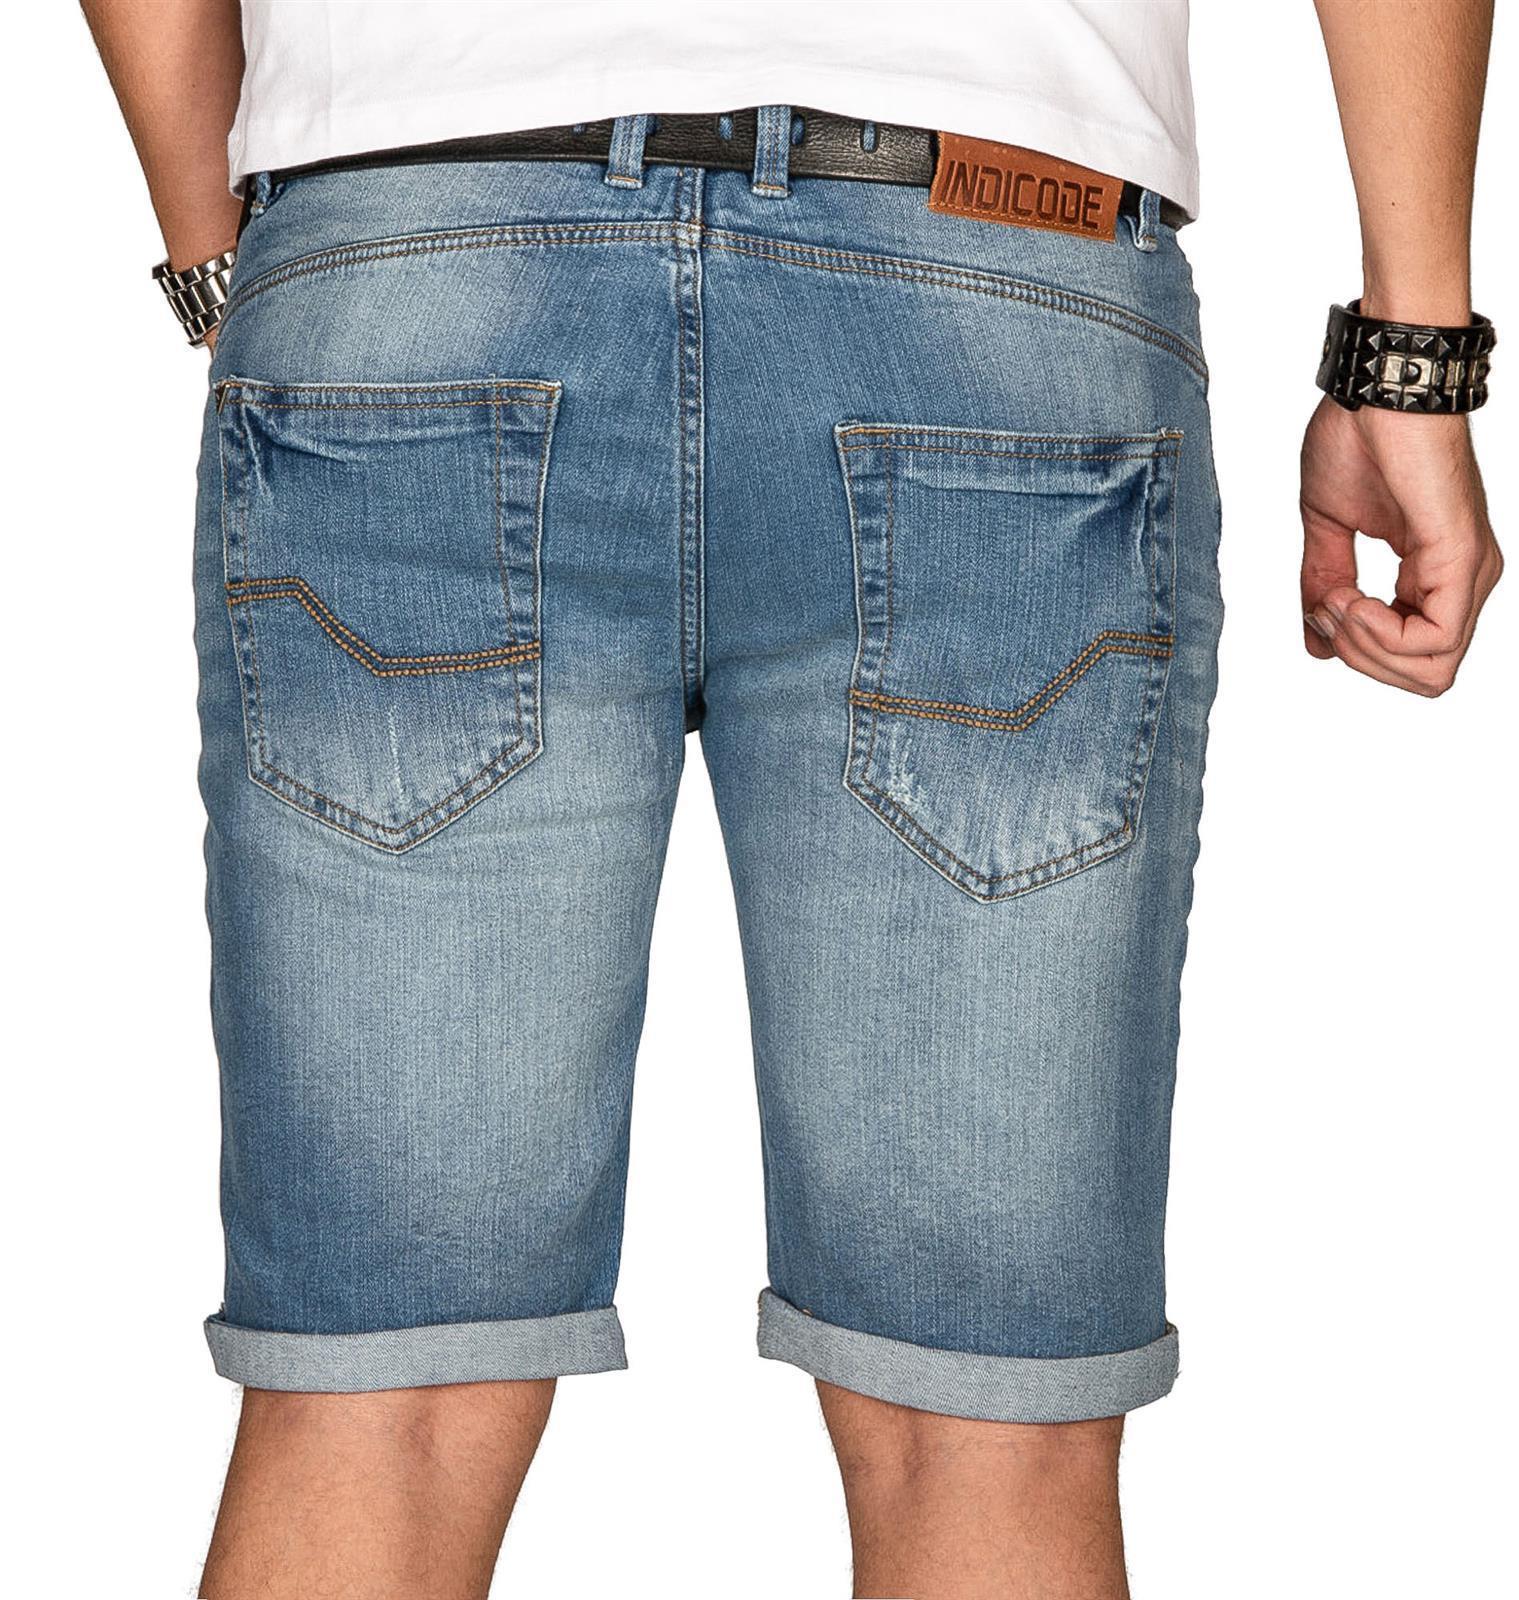 Indicode-Herren-Sommer-Bermuda-Jeans-Shorts-kurze-Hose-Sommerhose-Short-Neu-B556 Indexbild 13